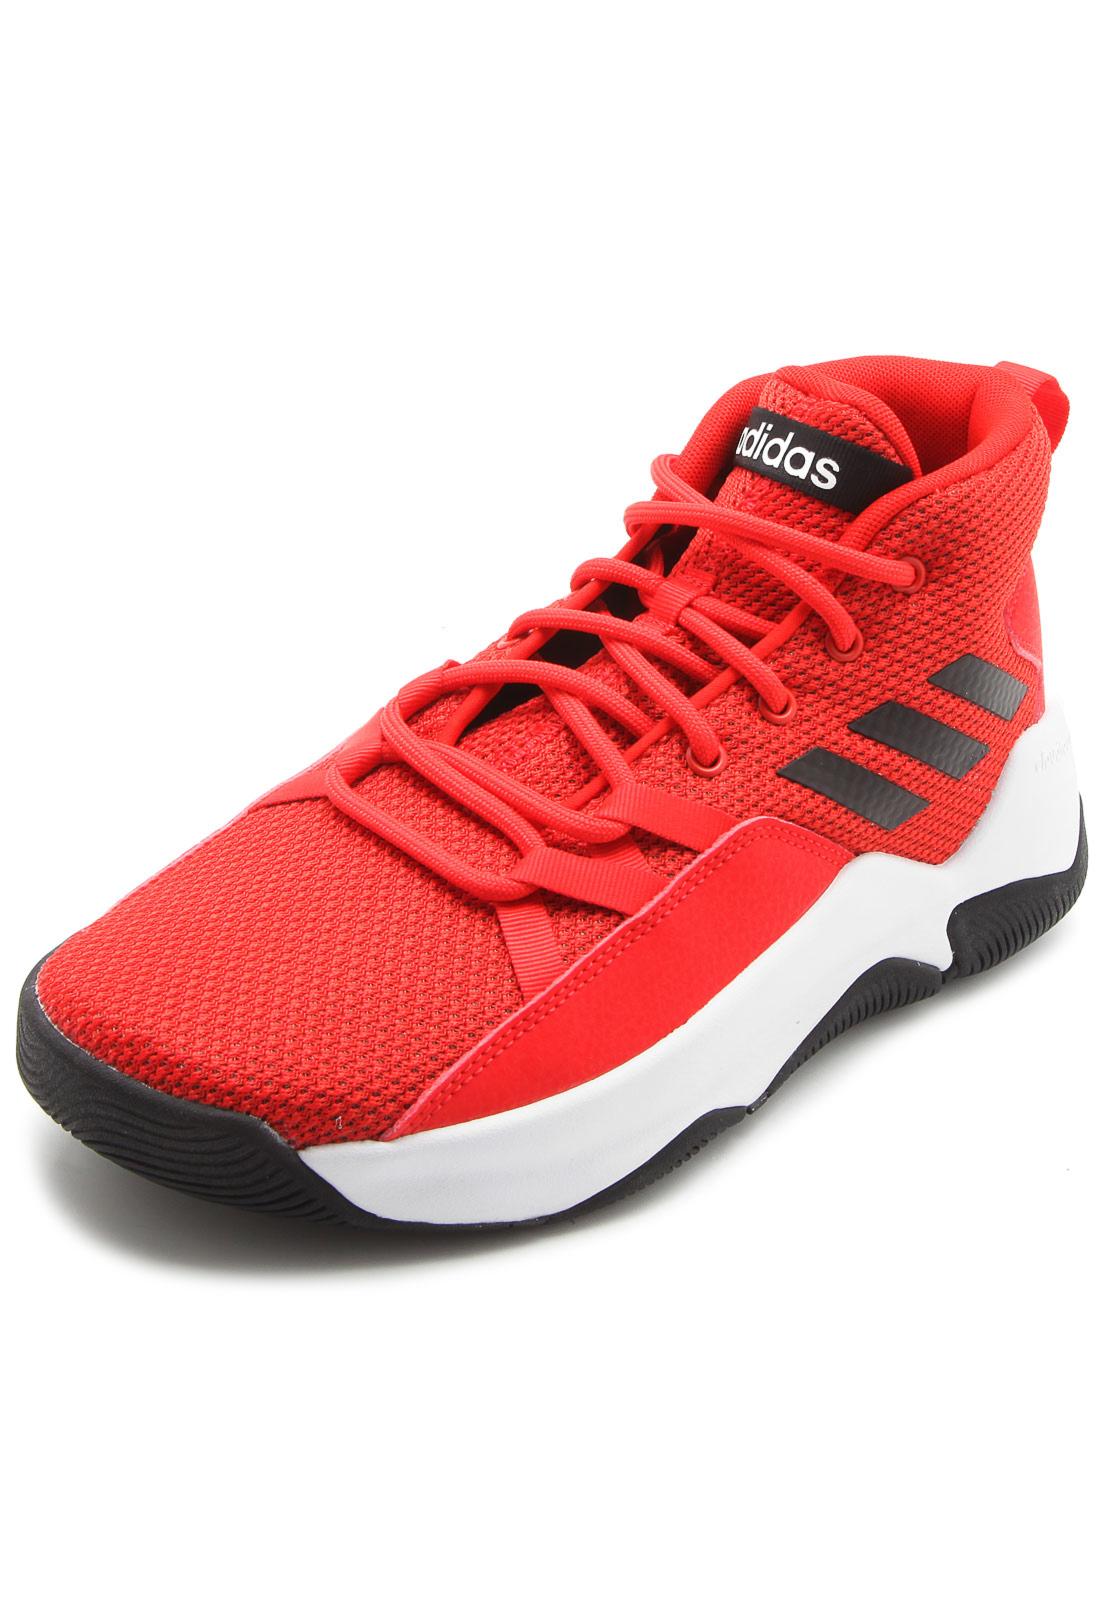 adidas streetfire red off 59% - www